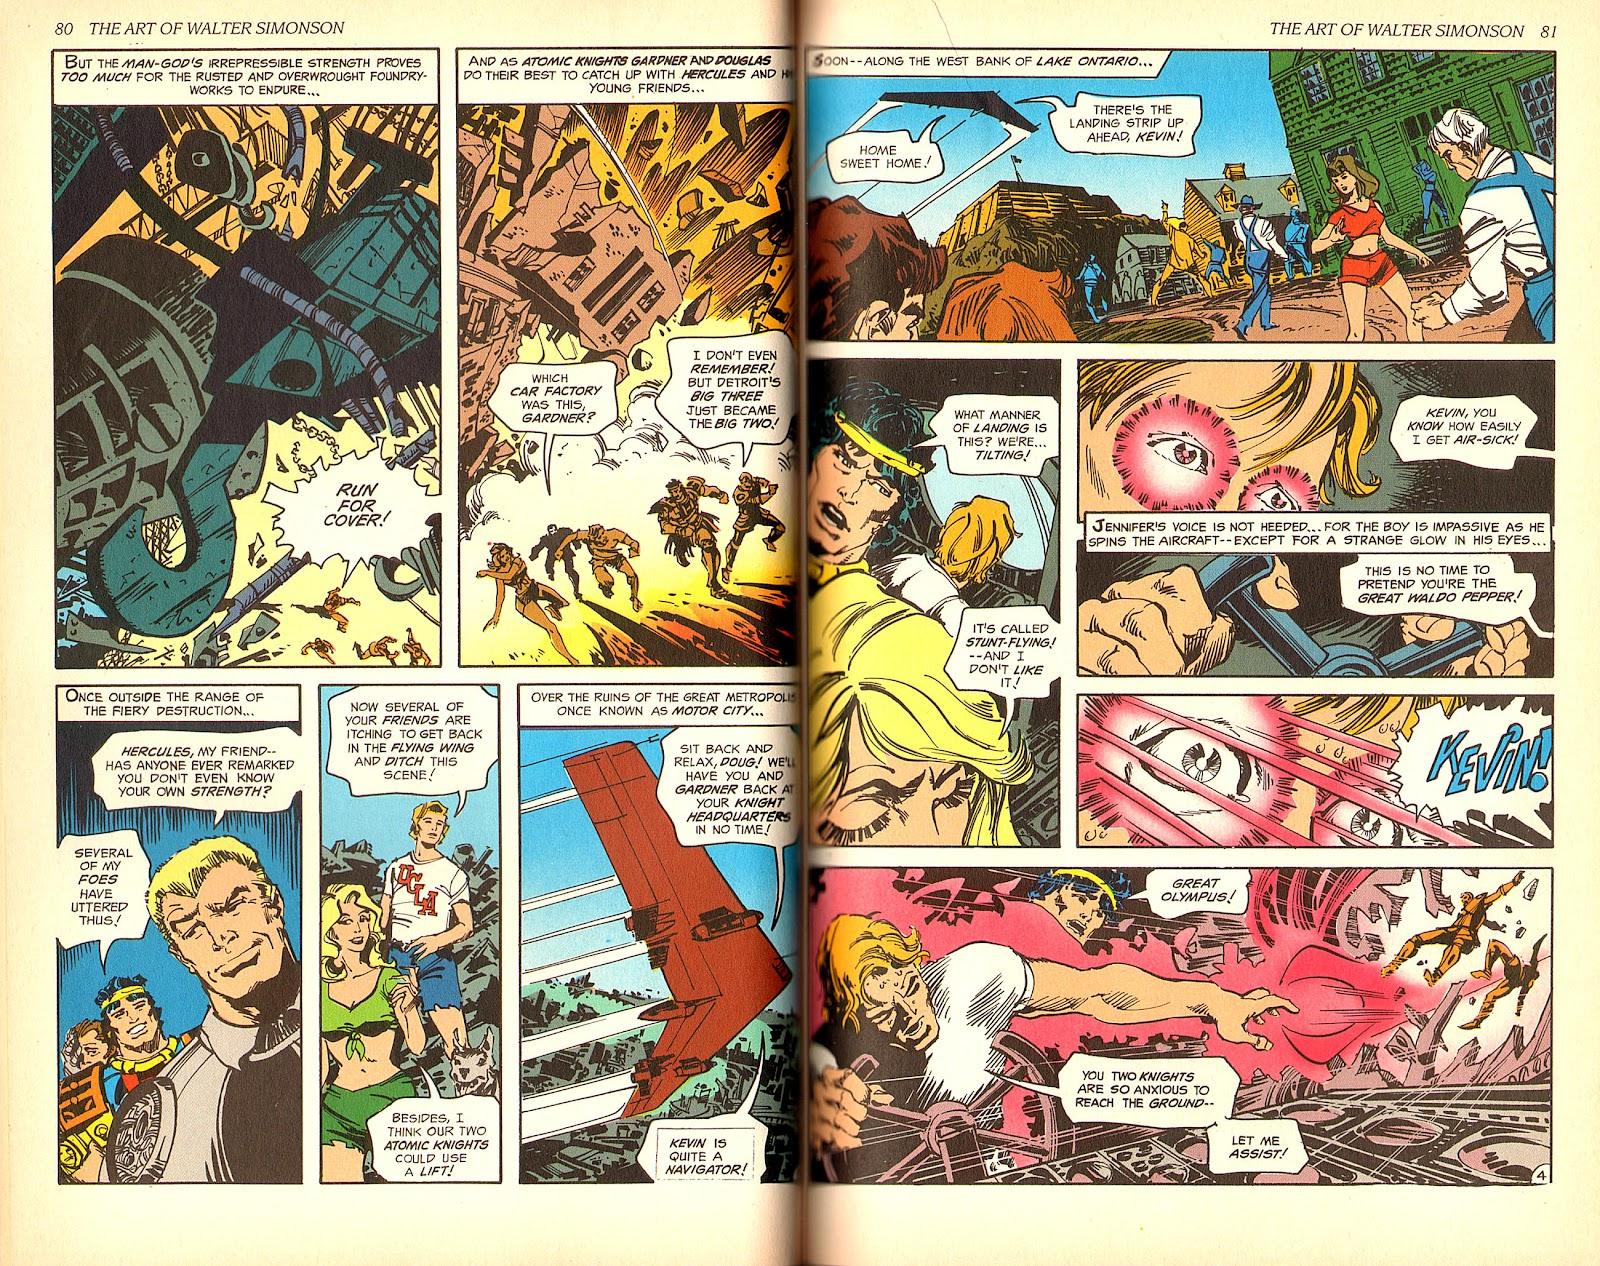 Read online The Art of Walter Simonson comic -  Issue # TPB - 42